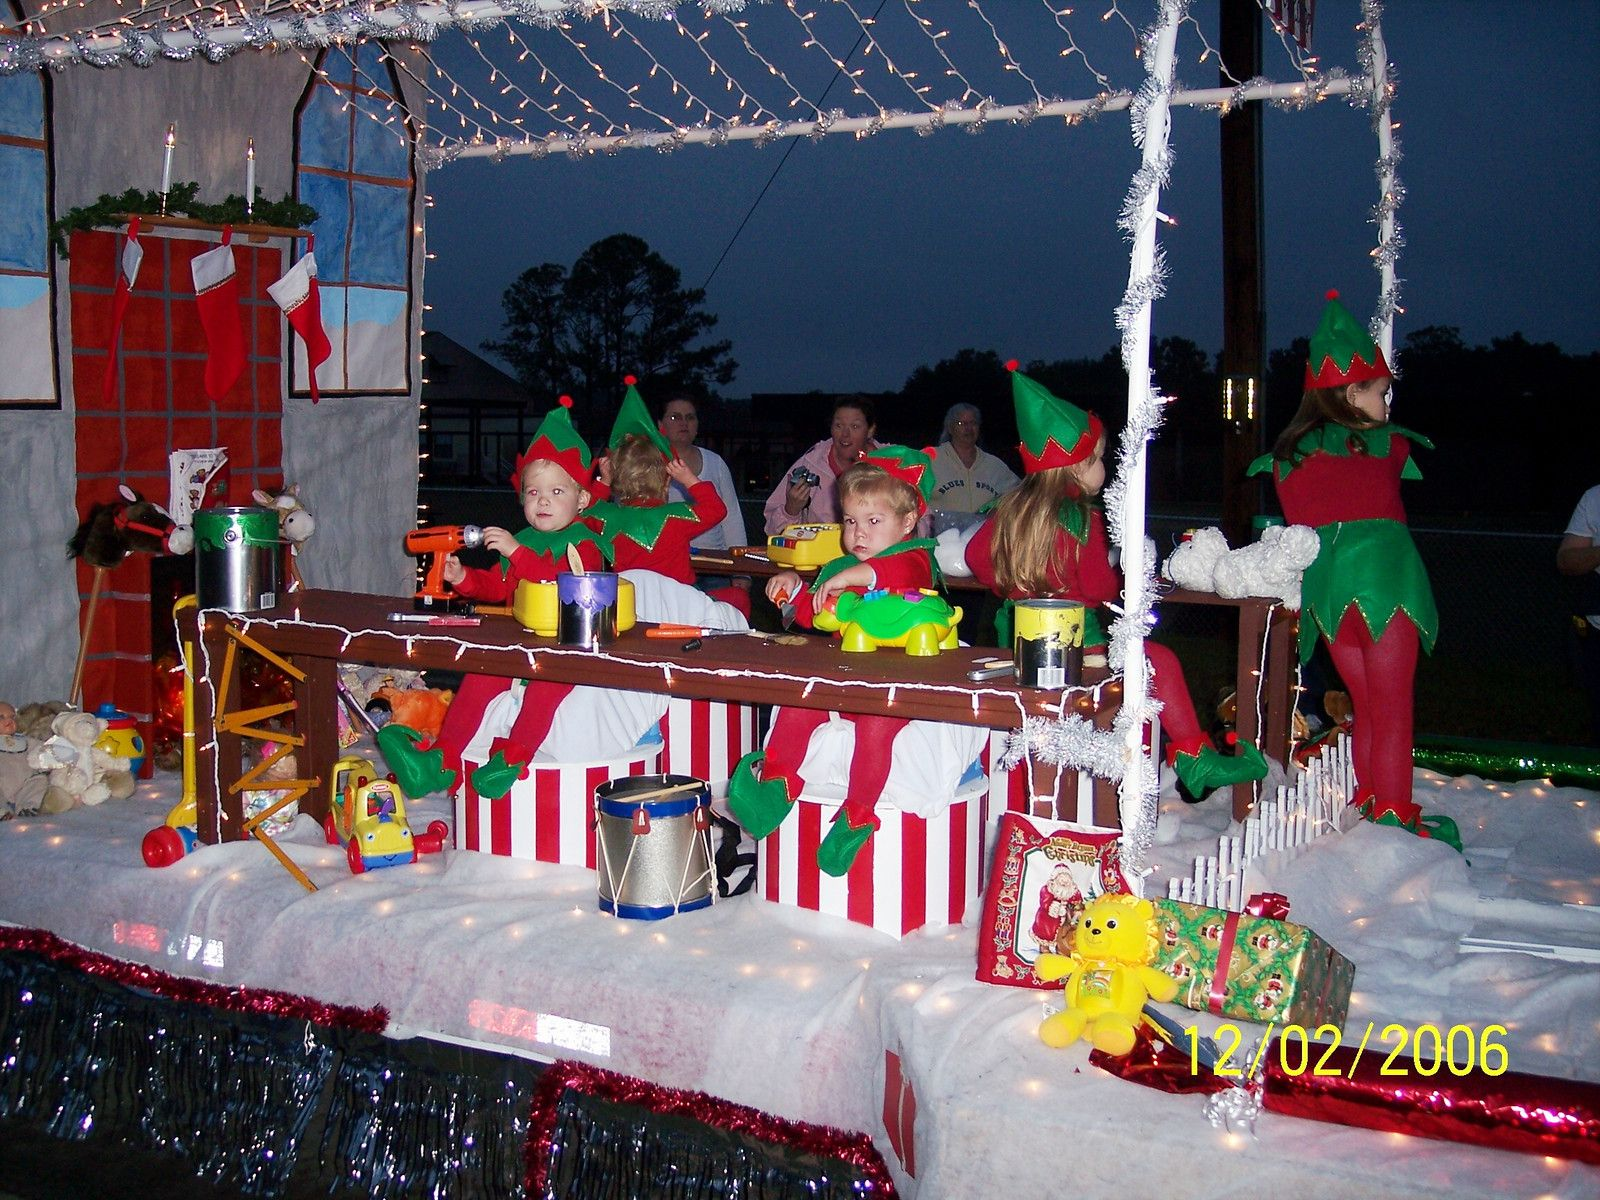 Keystone Heights Christmas Parade 2020 A Great Image | Christmas parade, Christmas parade floats, Holiday